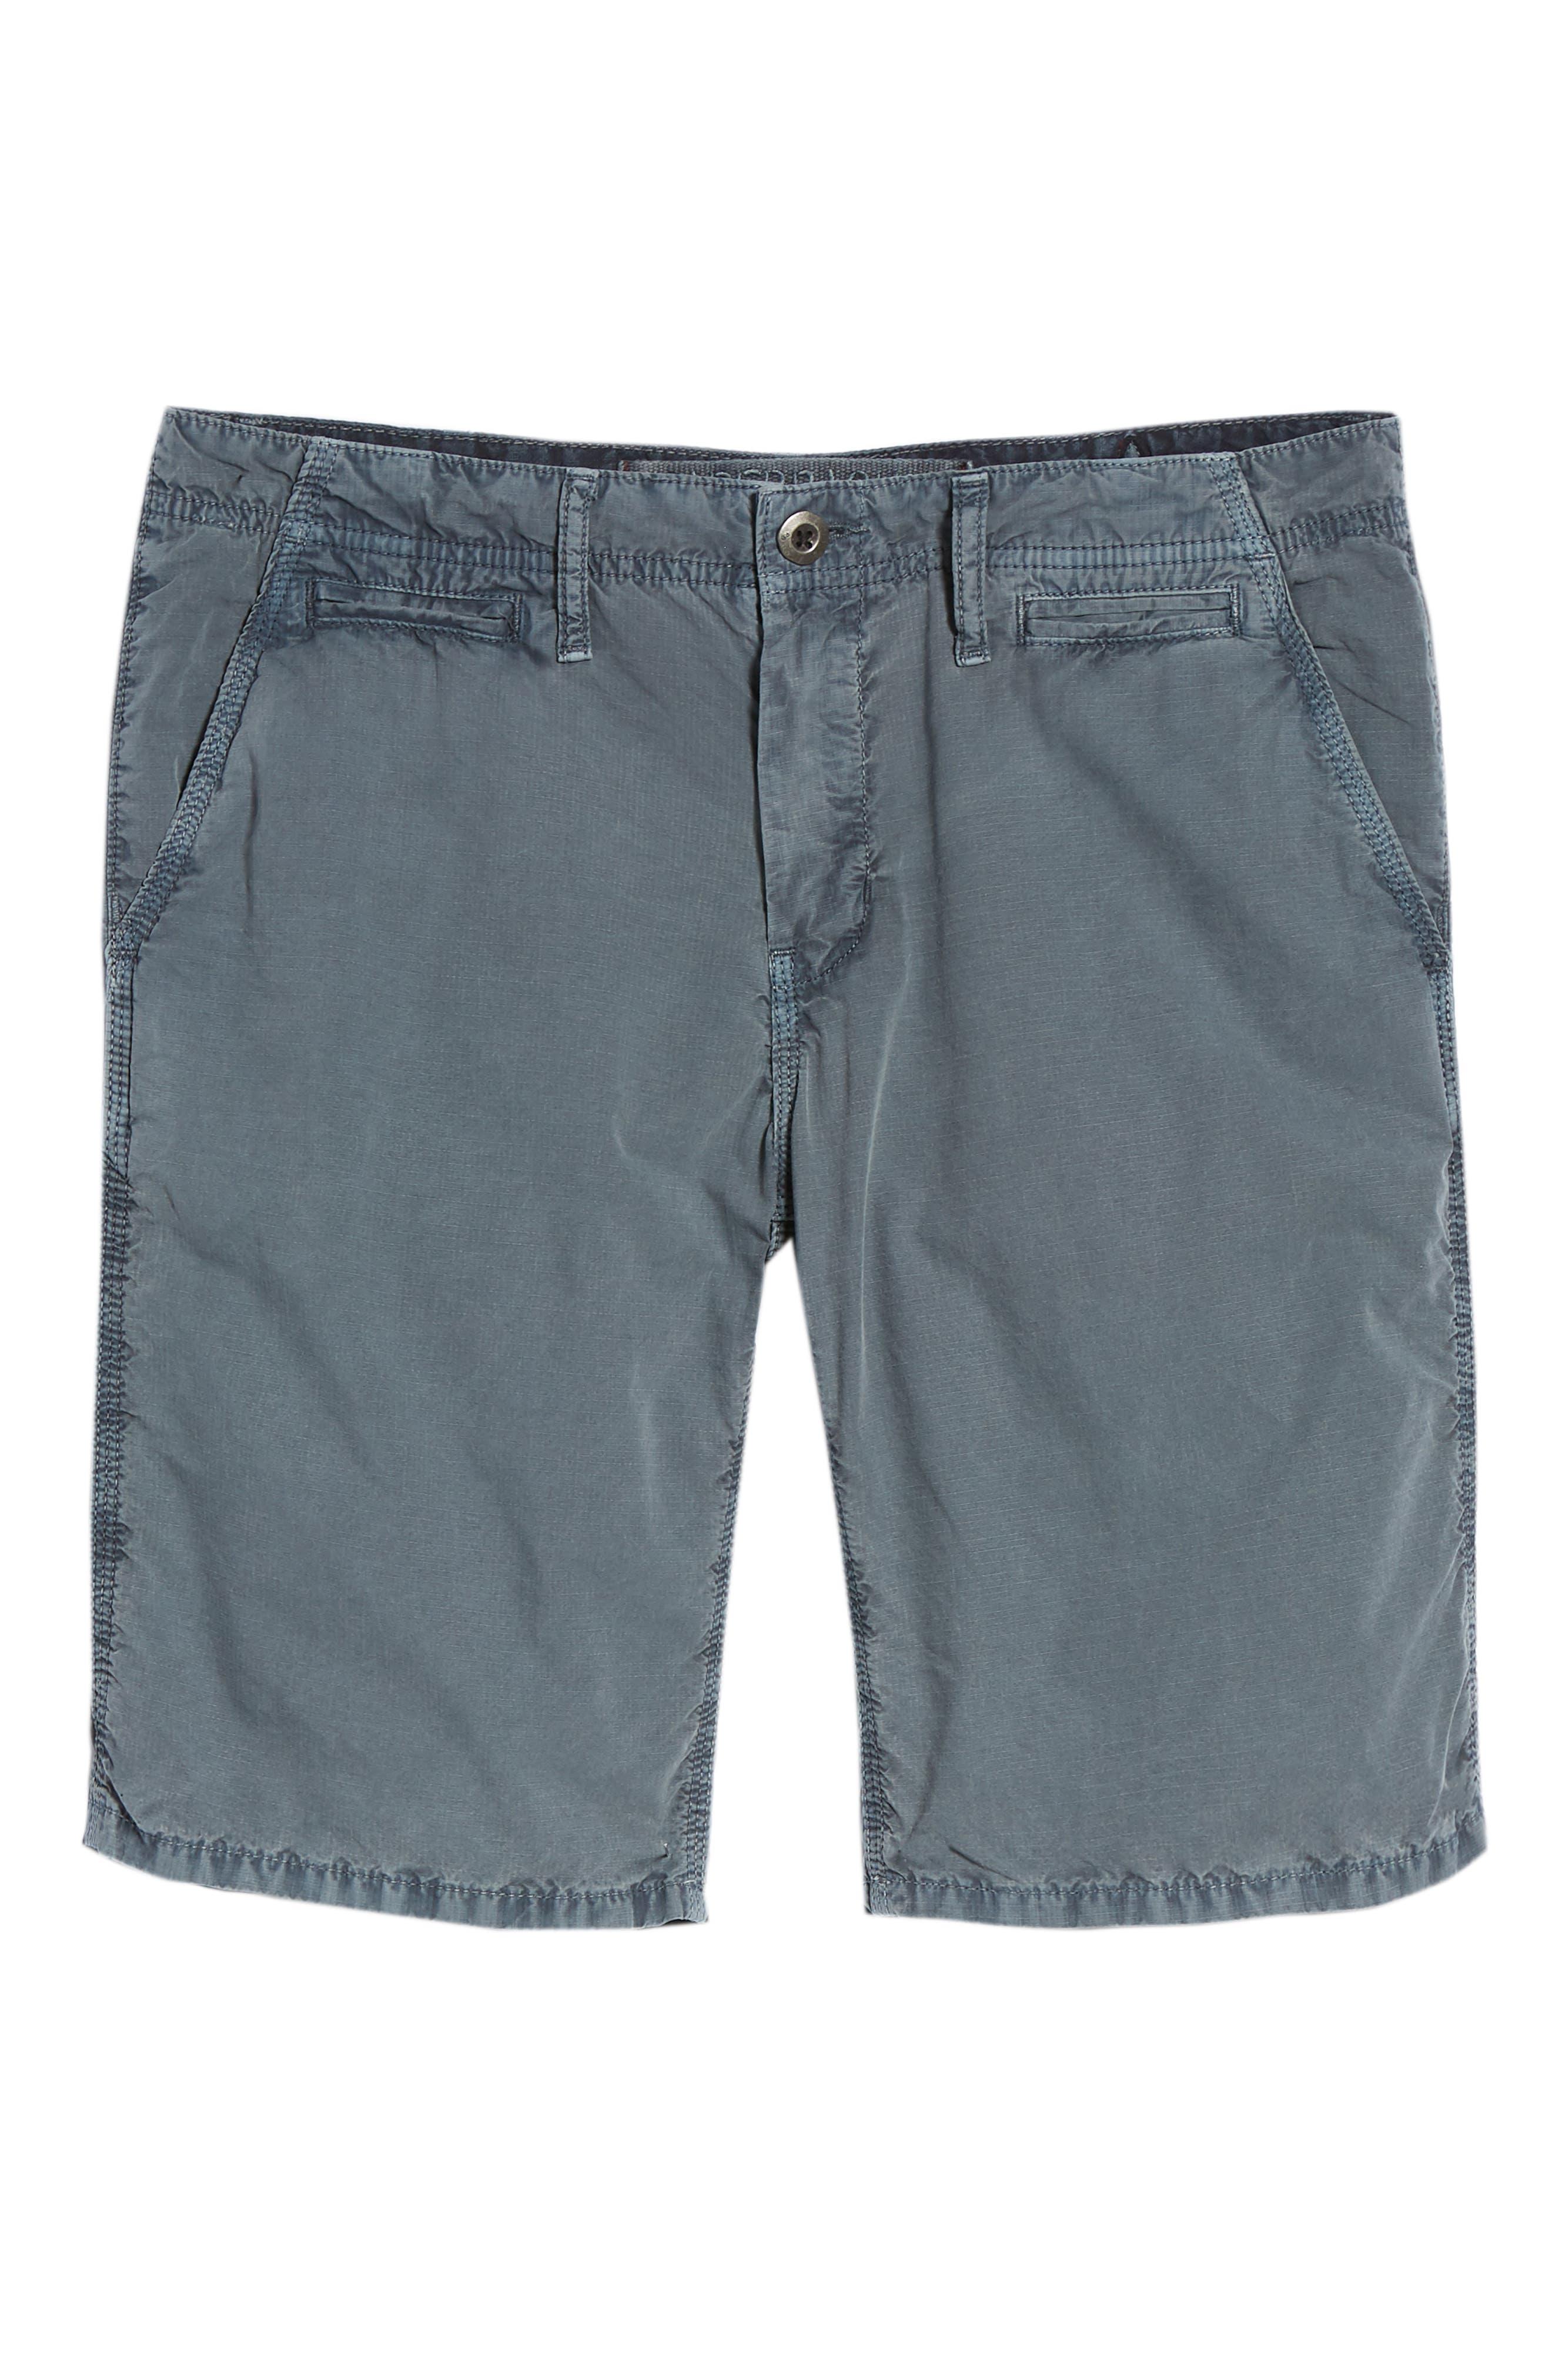 Palm Springs Shorts,                             Alternate thumbnail 25, color,